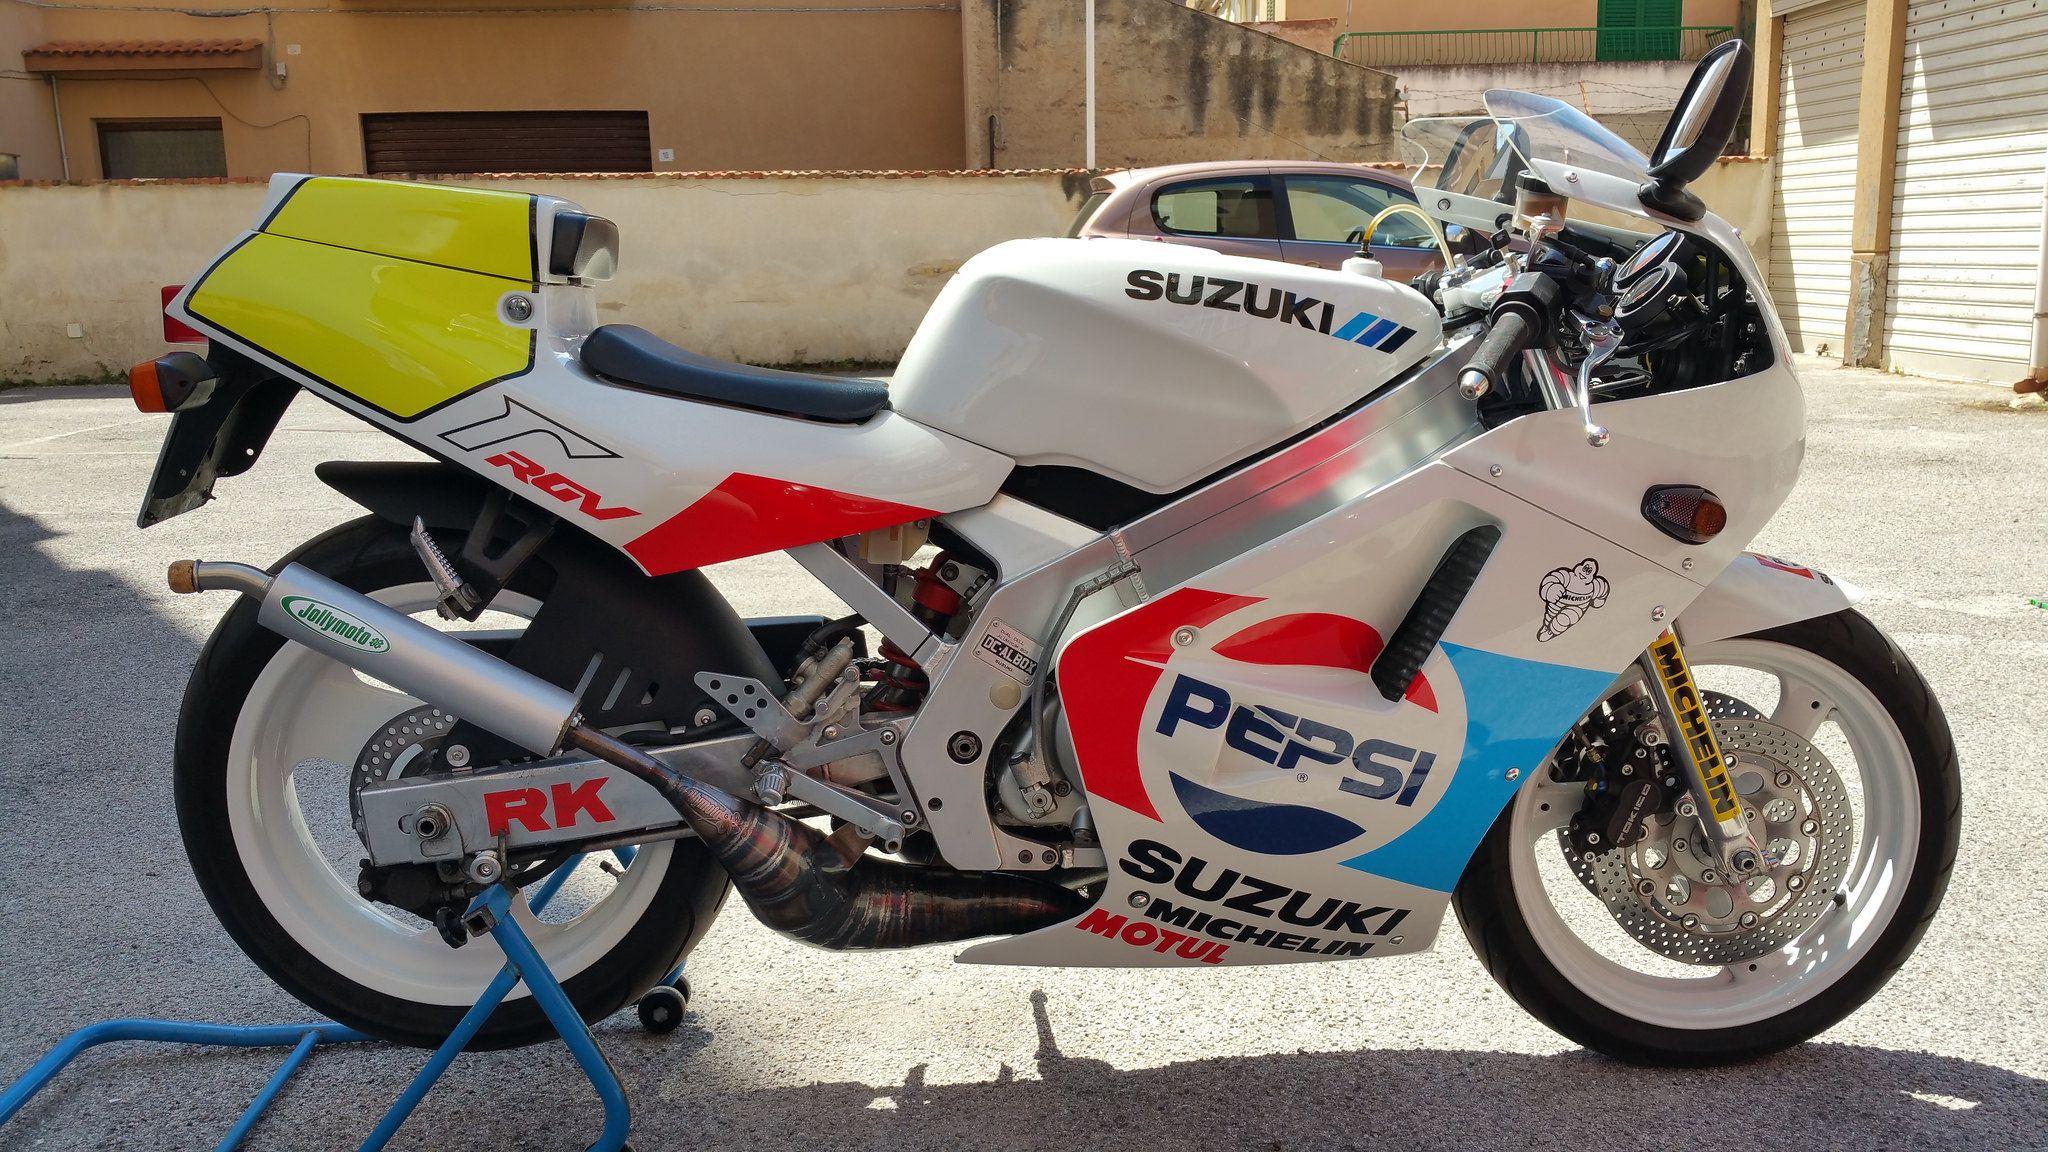 Suzuki Rgv 250 Vj21a Pepsi Edition Suzuki Suzuki Motorcycle Suzuki Bikes